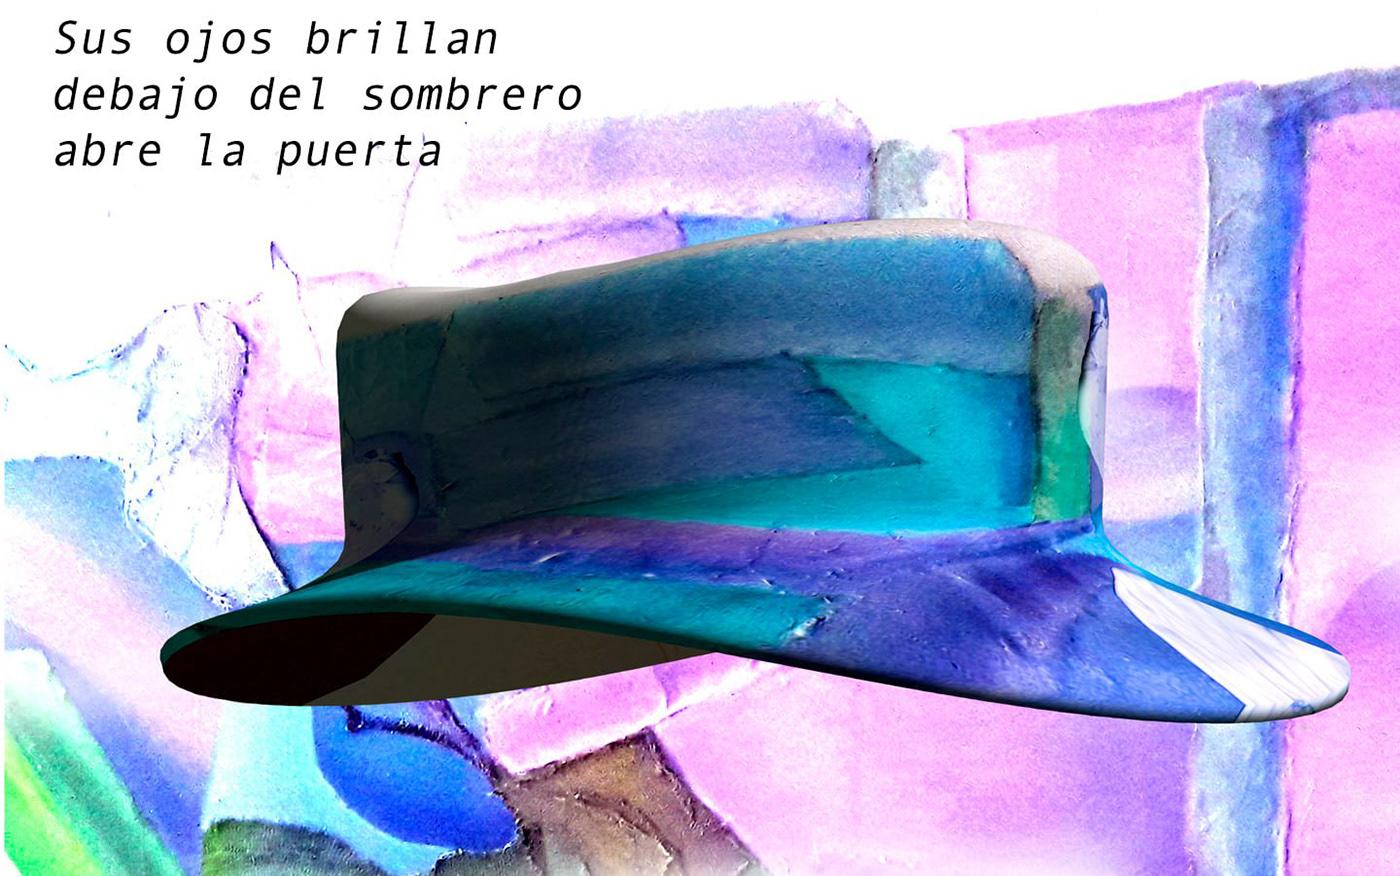 gorro moda Personalidad poesia sombrerero sombrerillo sombrero sombrero de ala ancha sombrero de copa